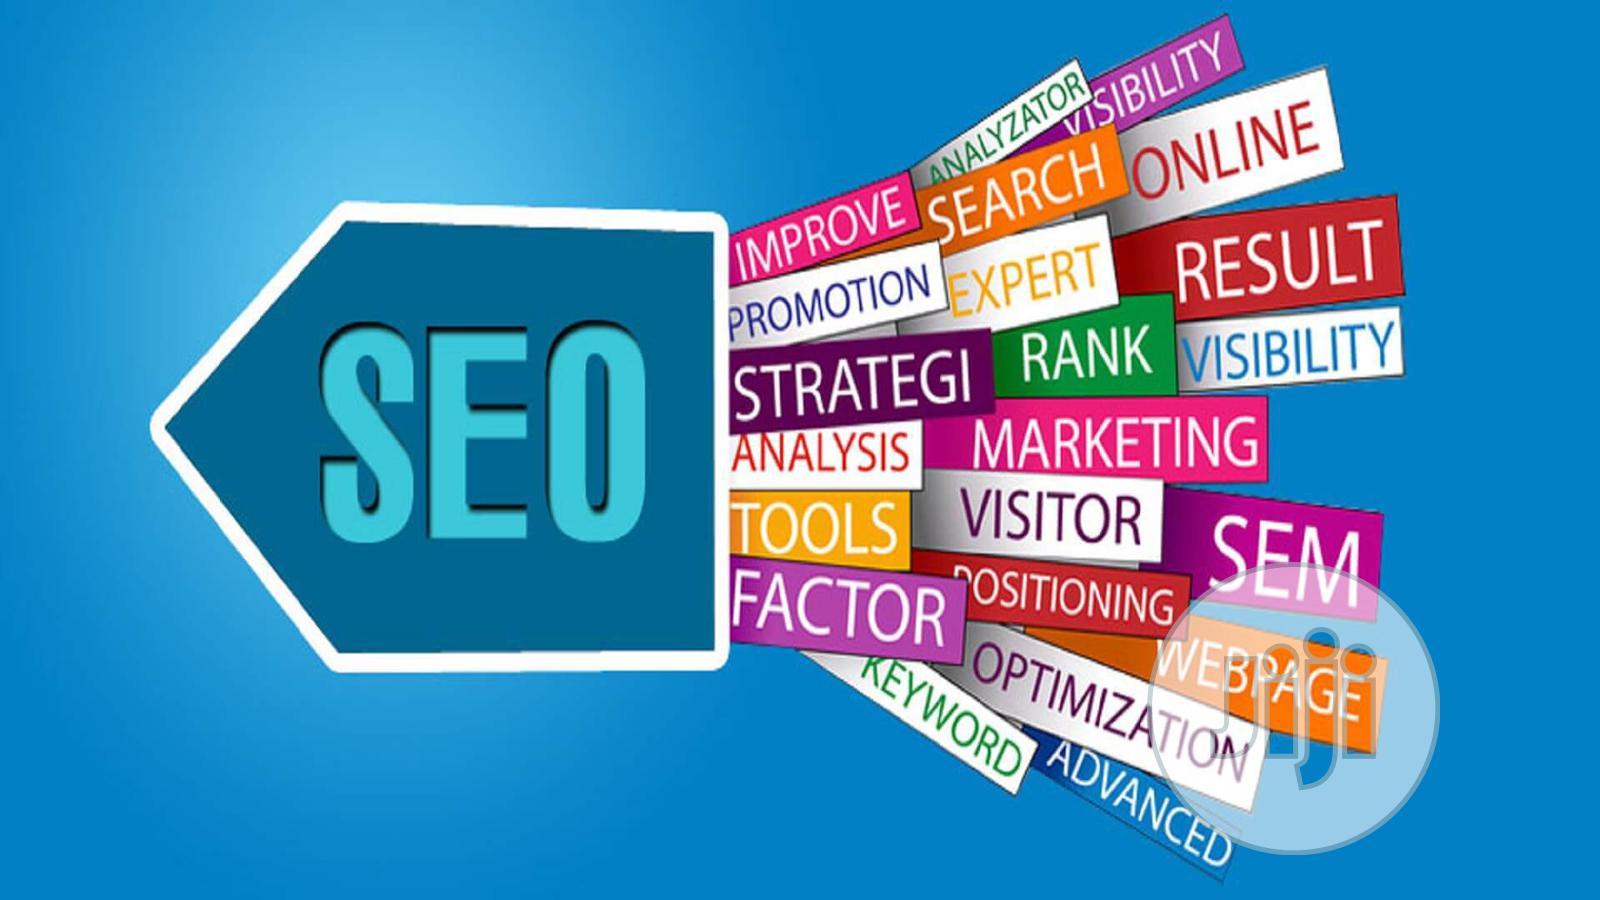 SEO 2019: Complete SEO Training + SEO For Wordpress Websites